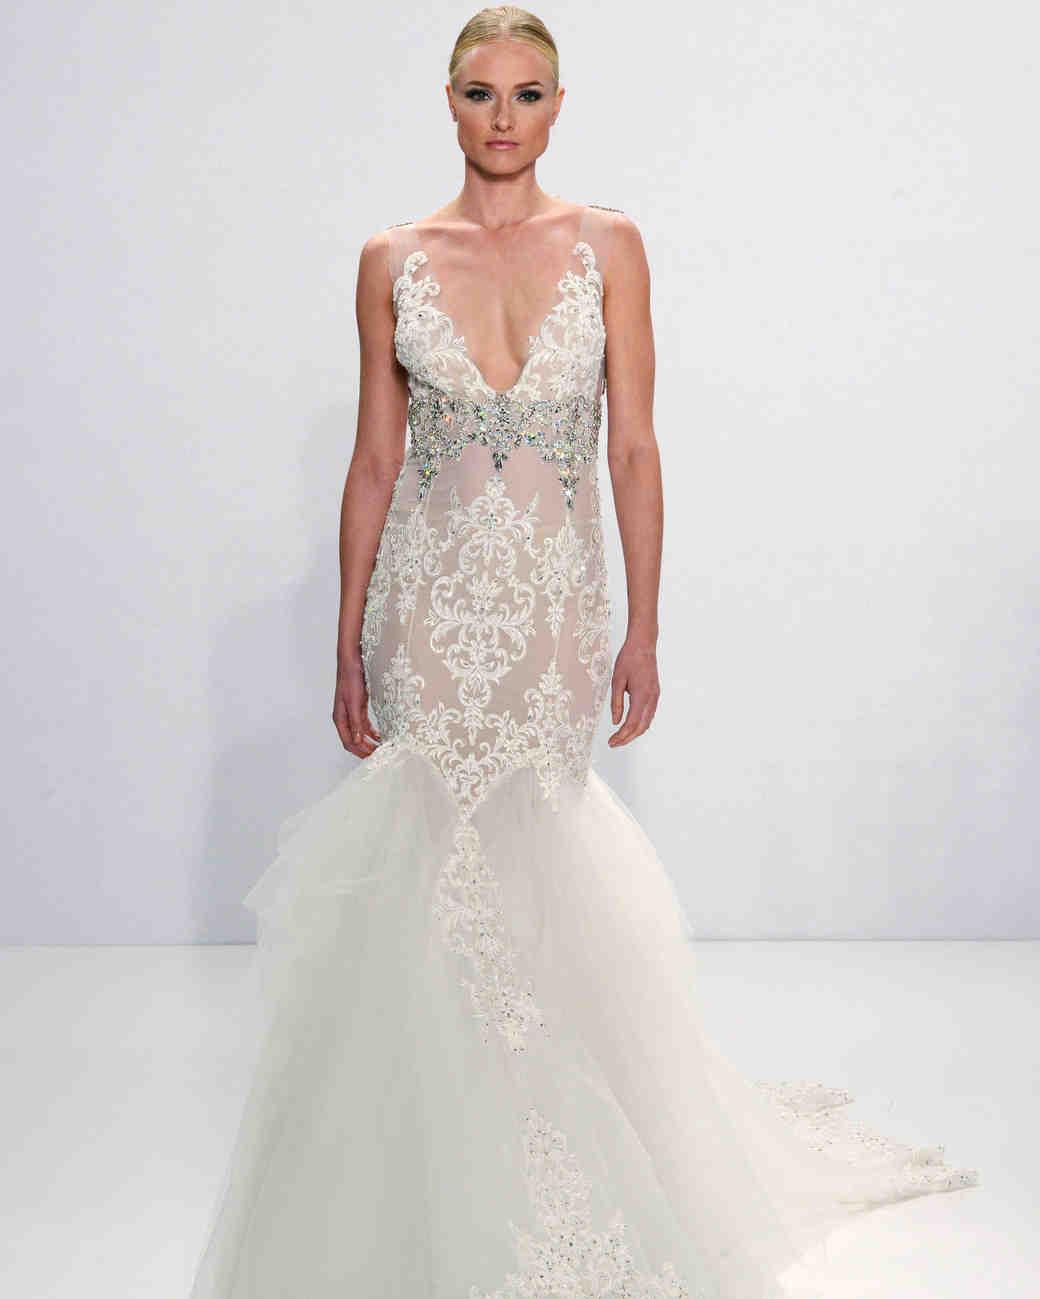 Pnina Tornai Wedding Dress Say Yes To The Dress